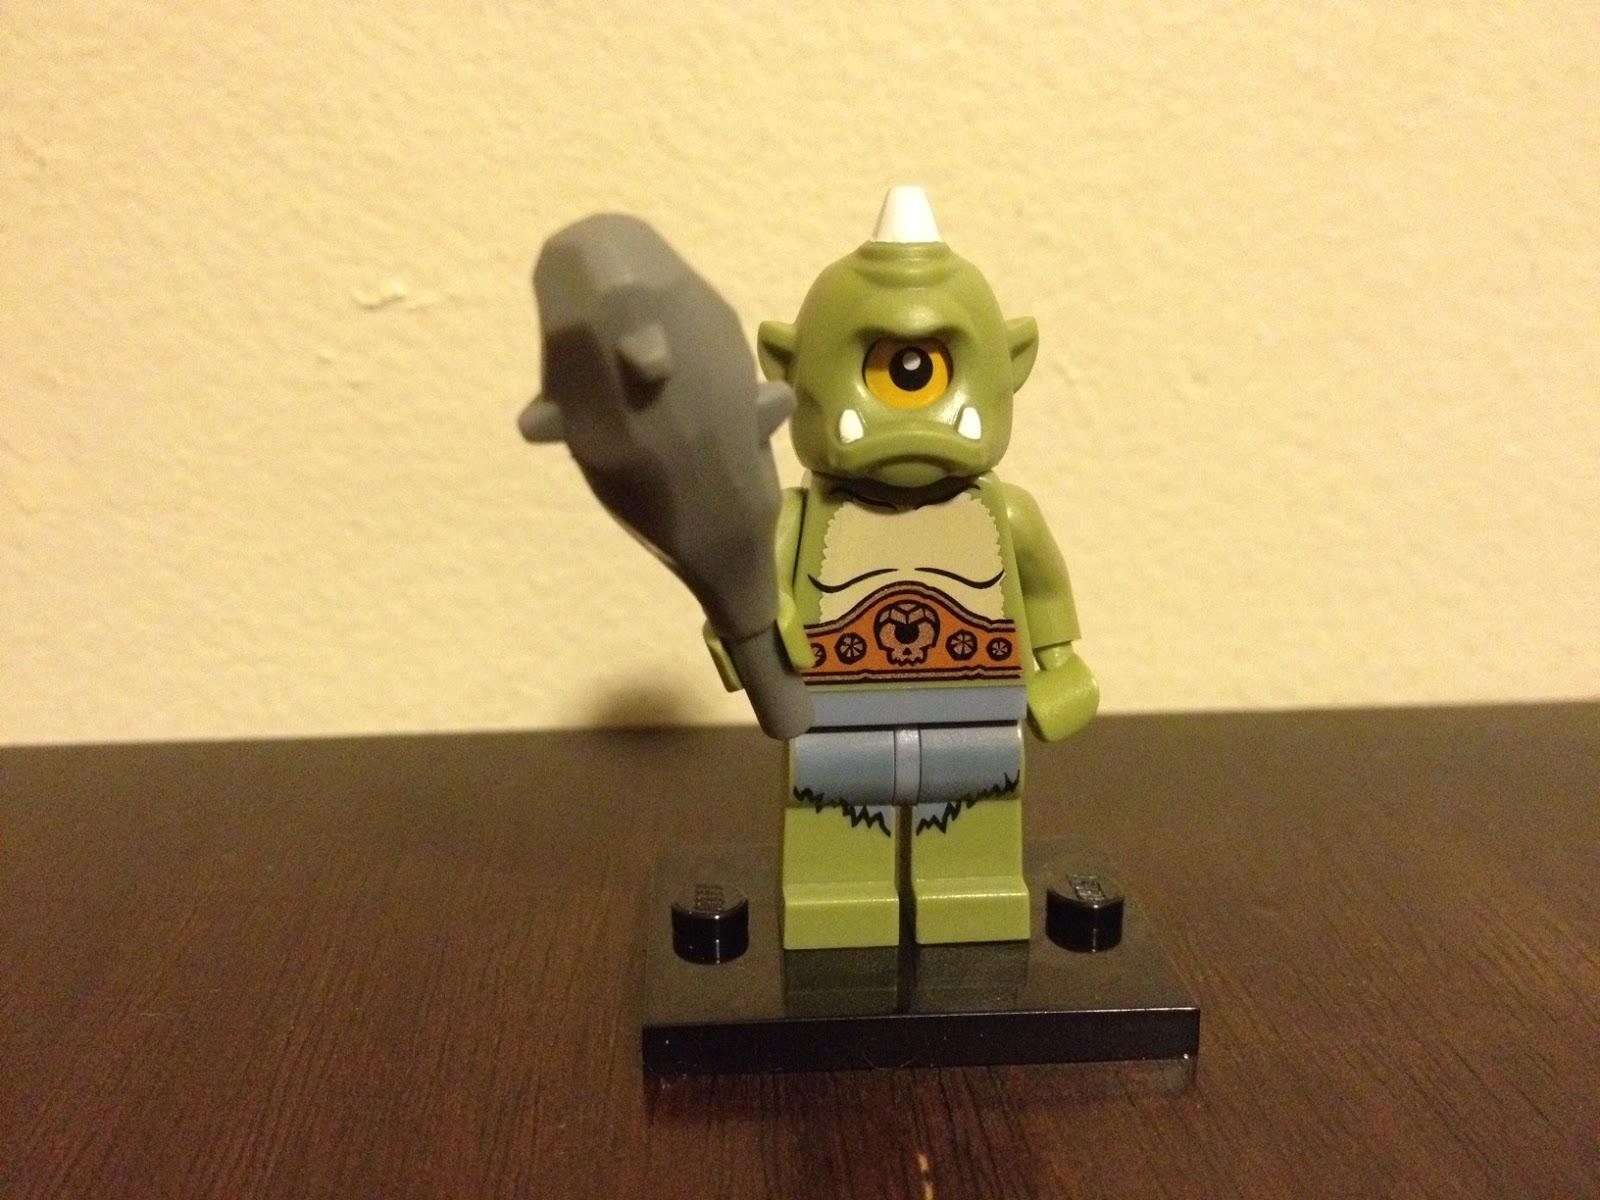 LEGO OGRE - Building Ogre Miniatures with LEGO Bricks